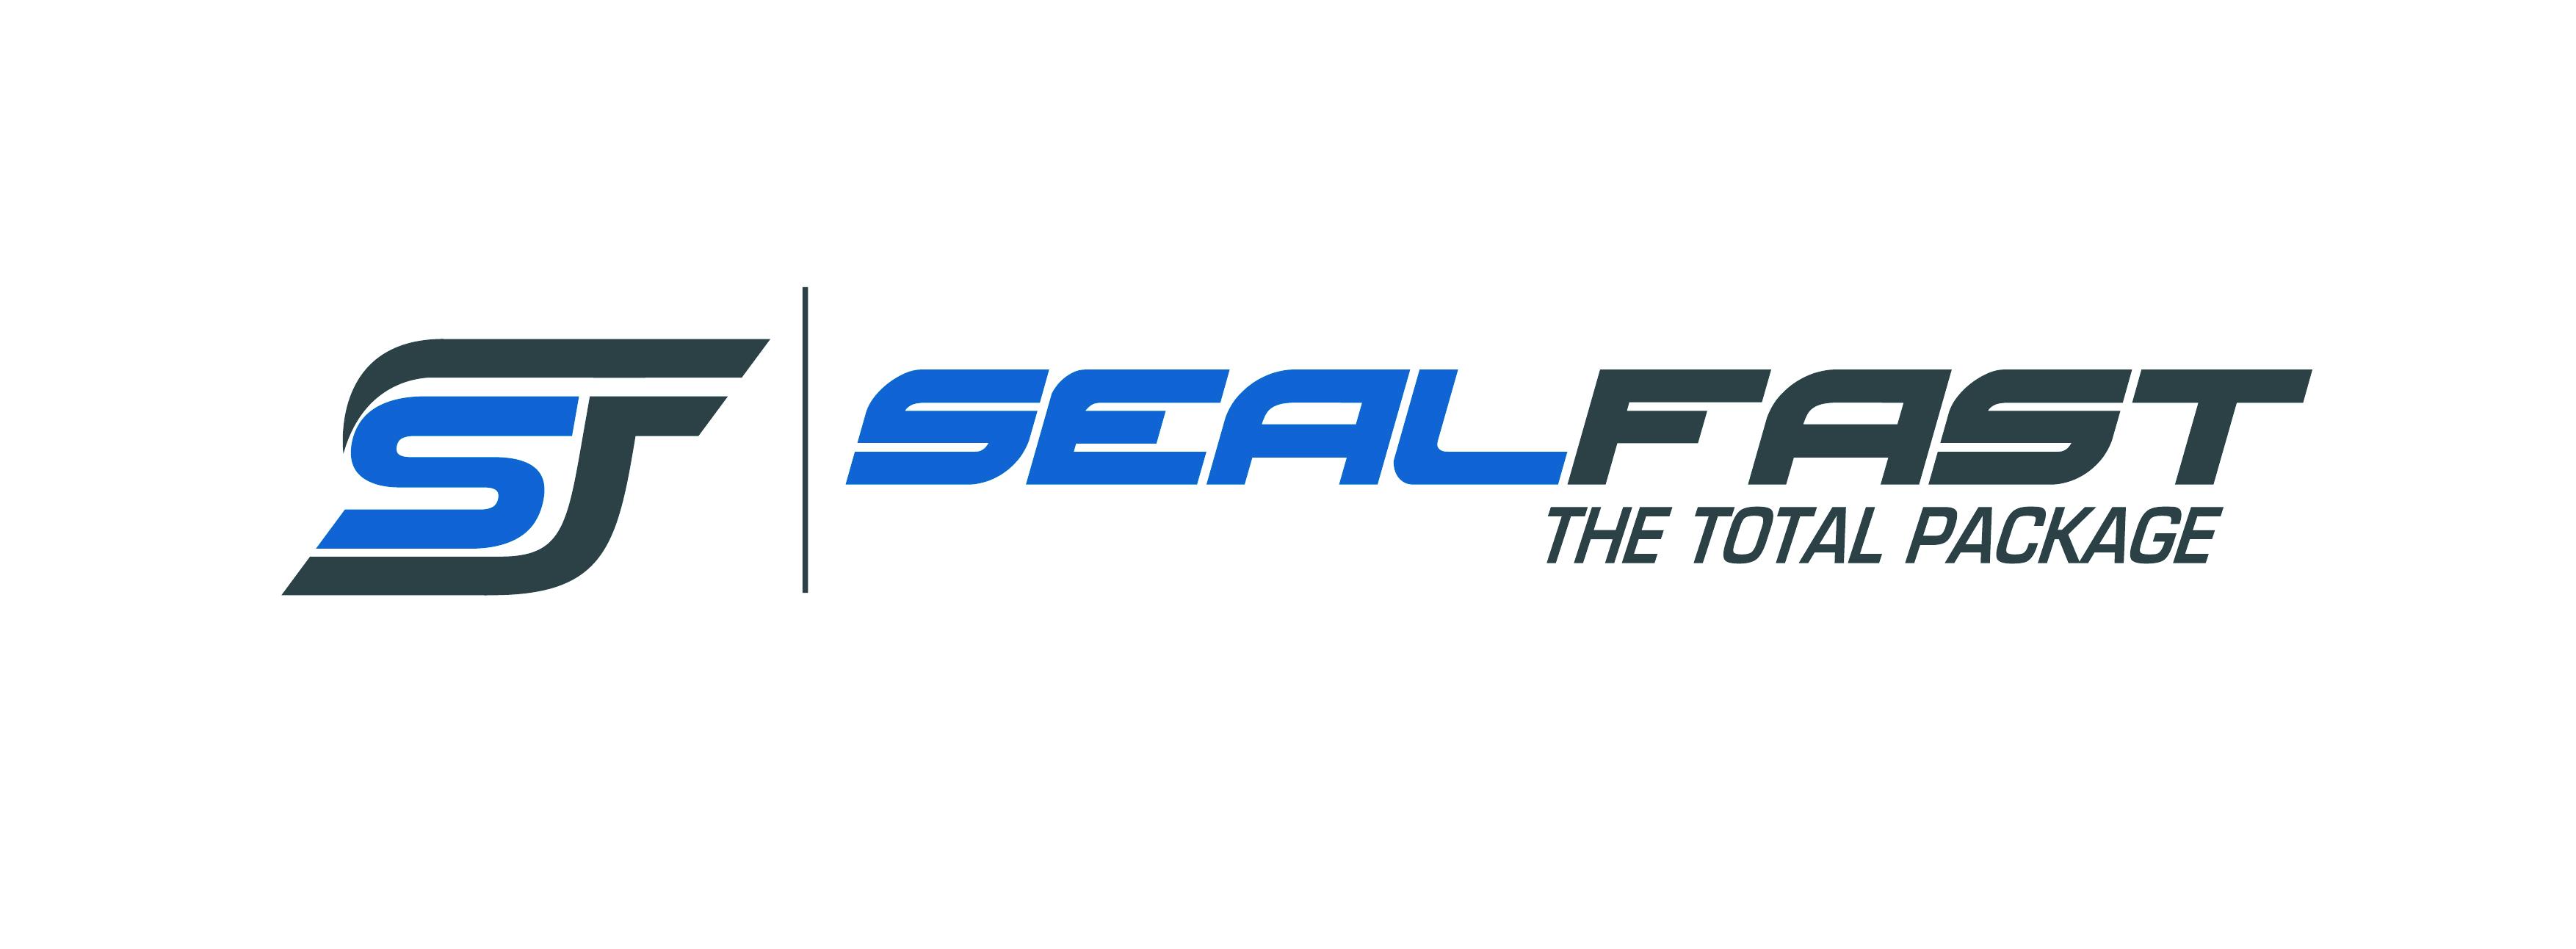 Seal Fast - Catálogo